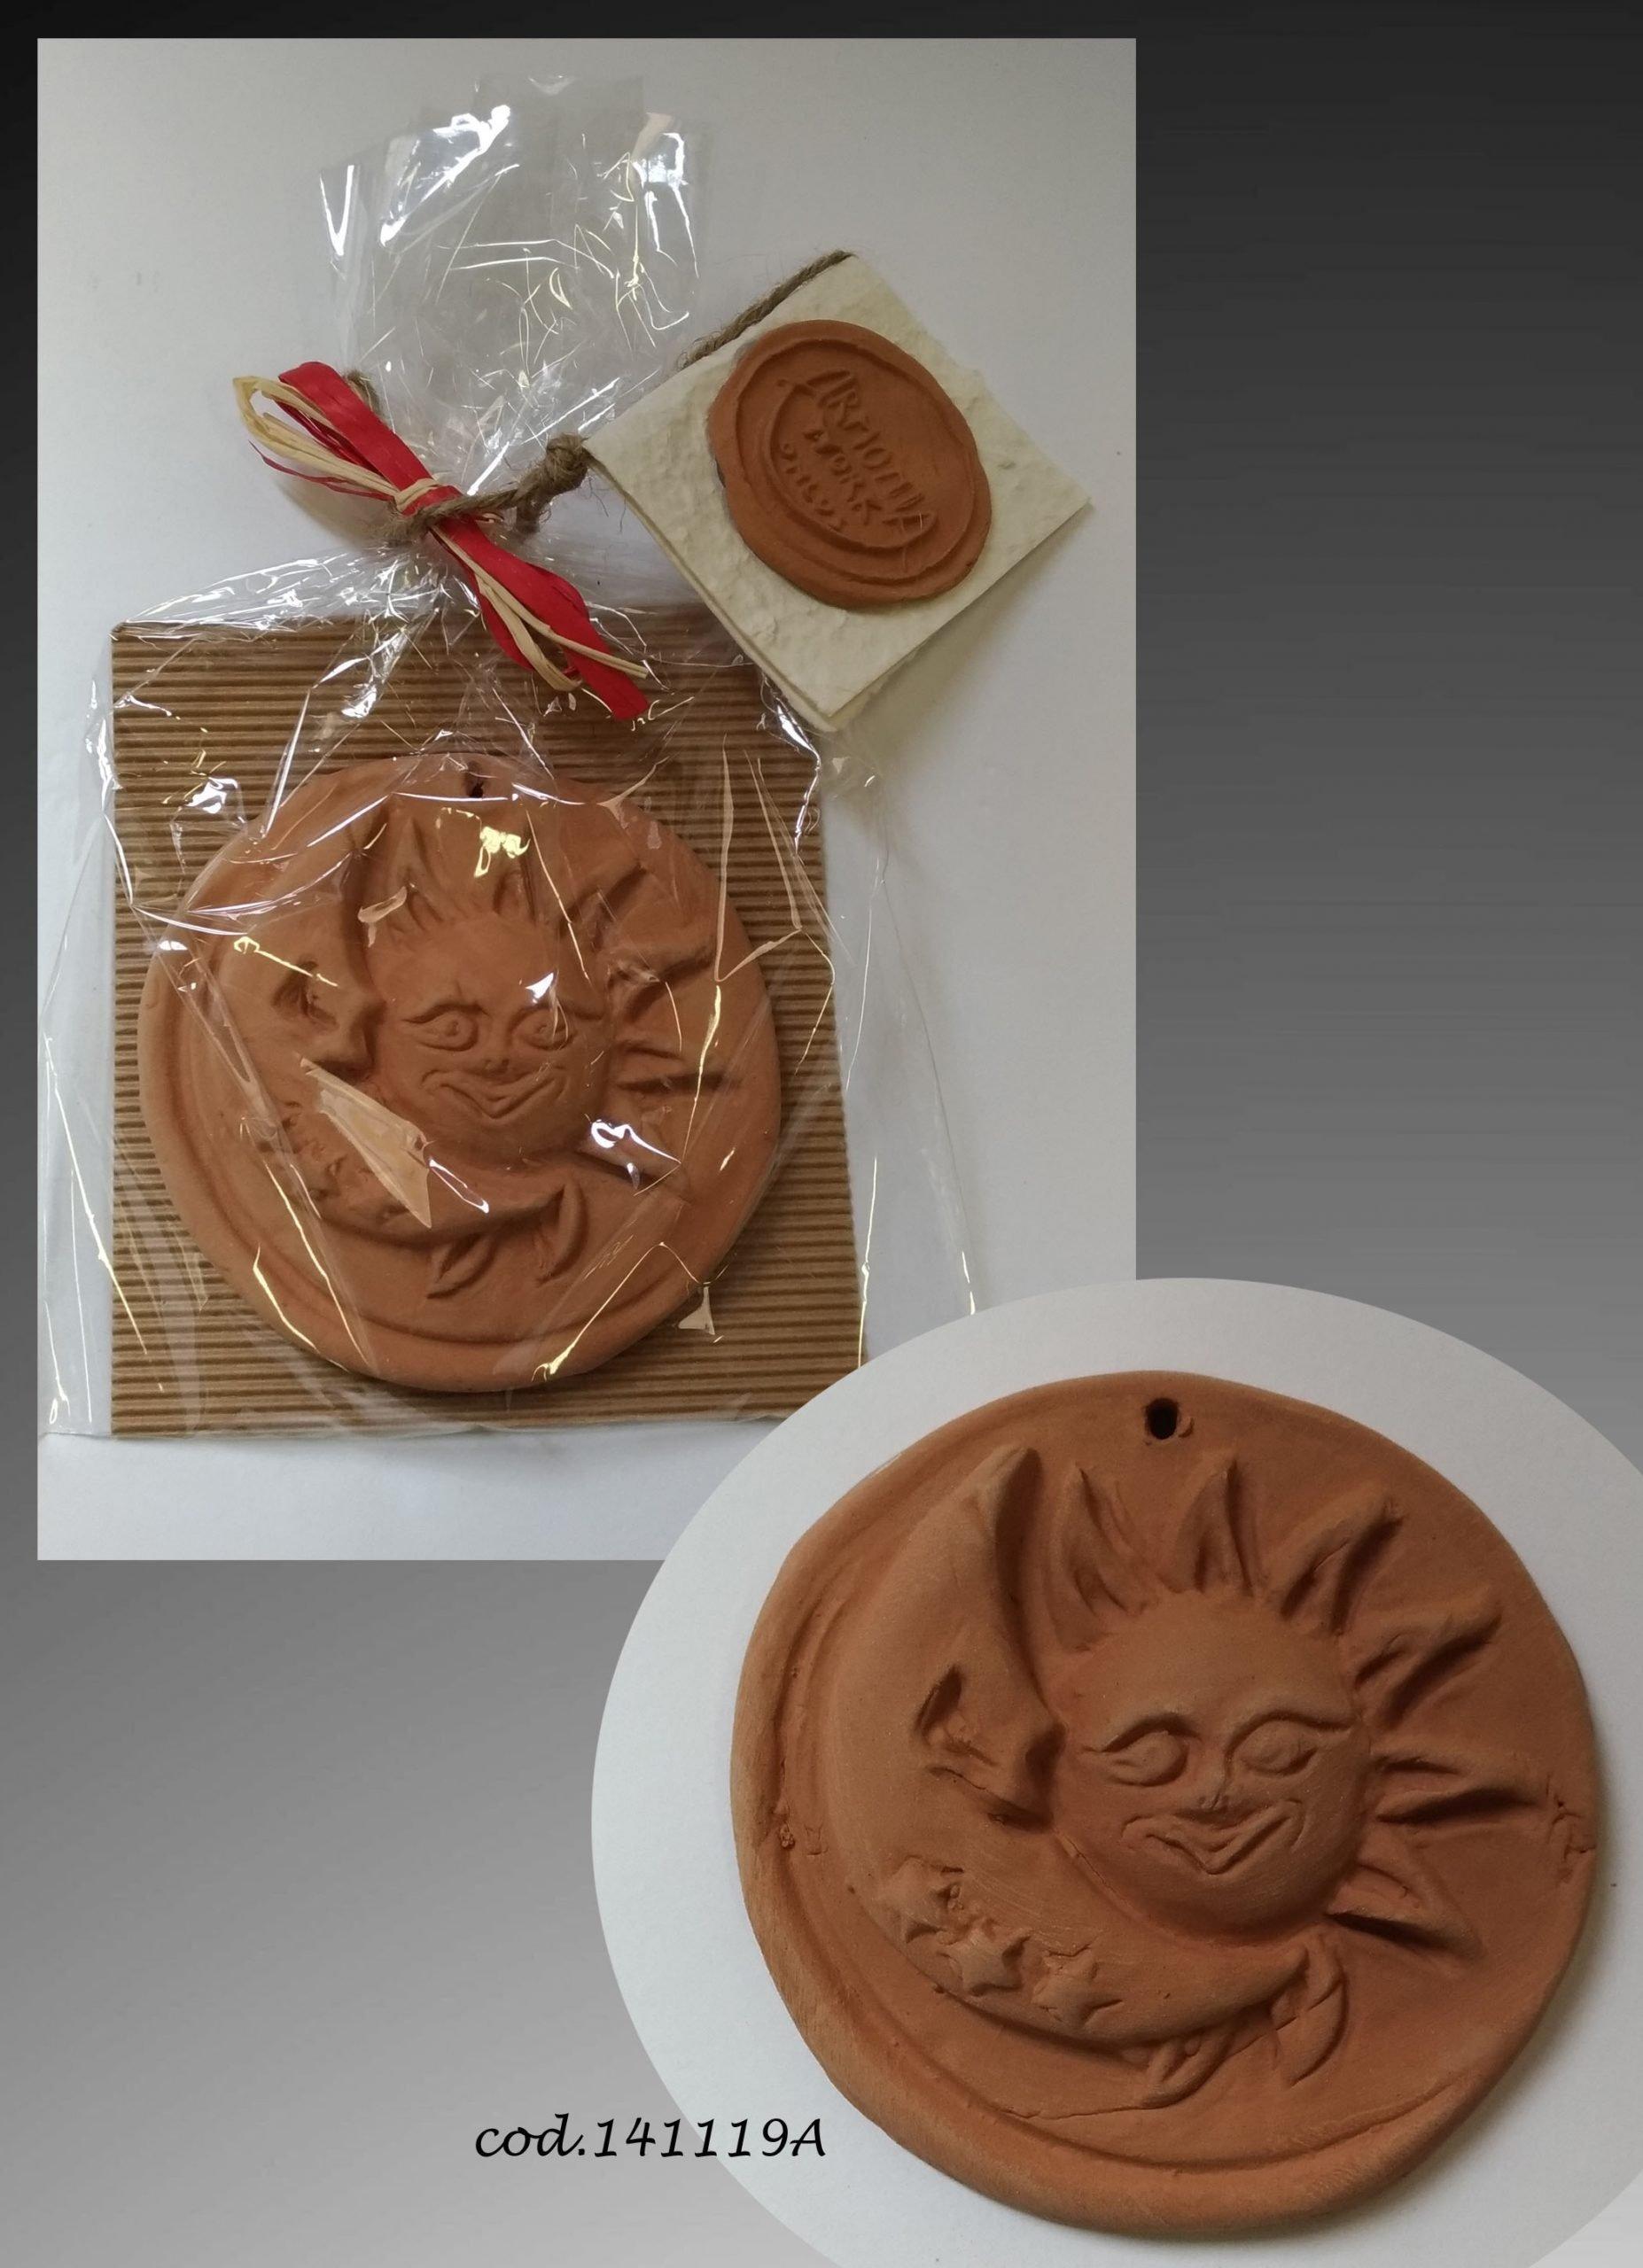 ceramica-artigianale-armonia-work-centallo